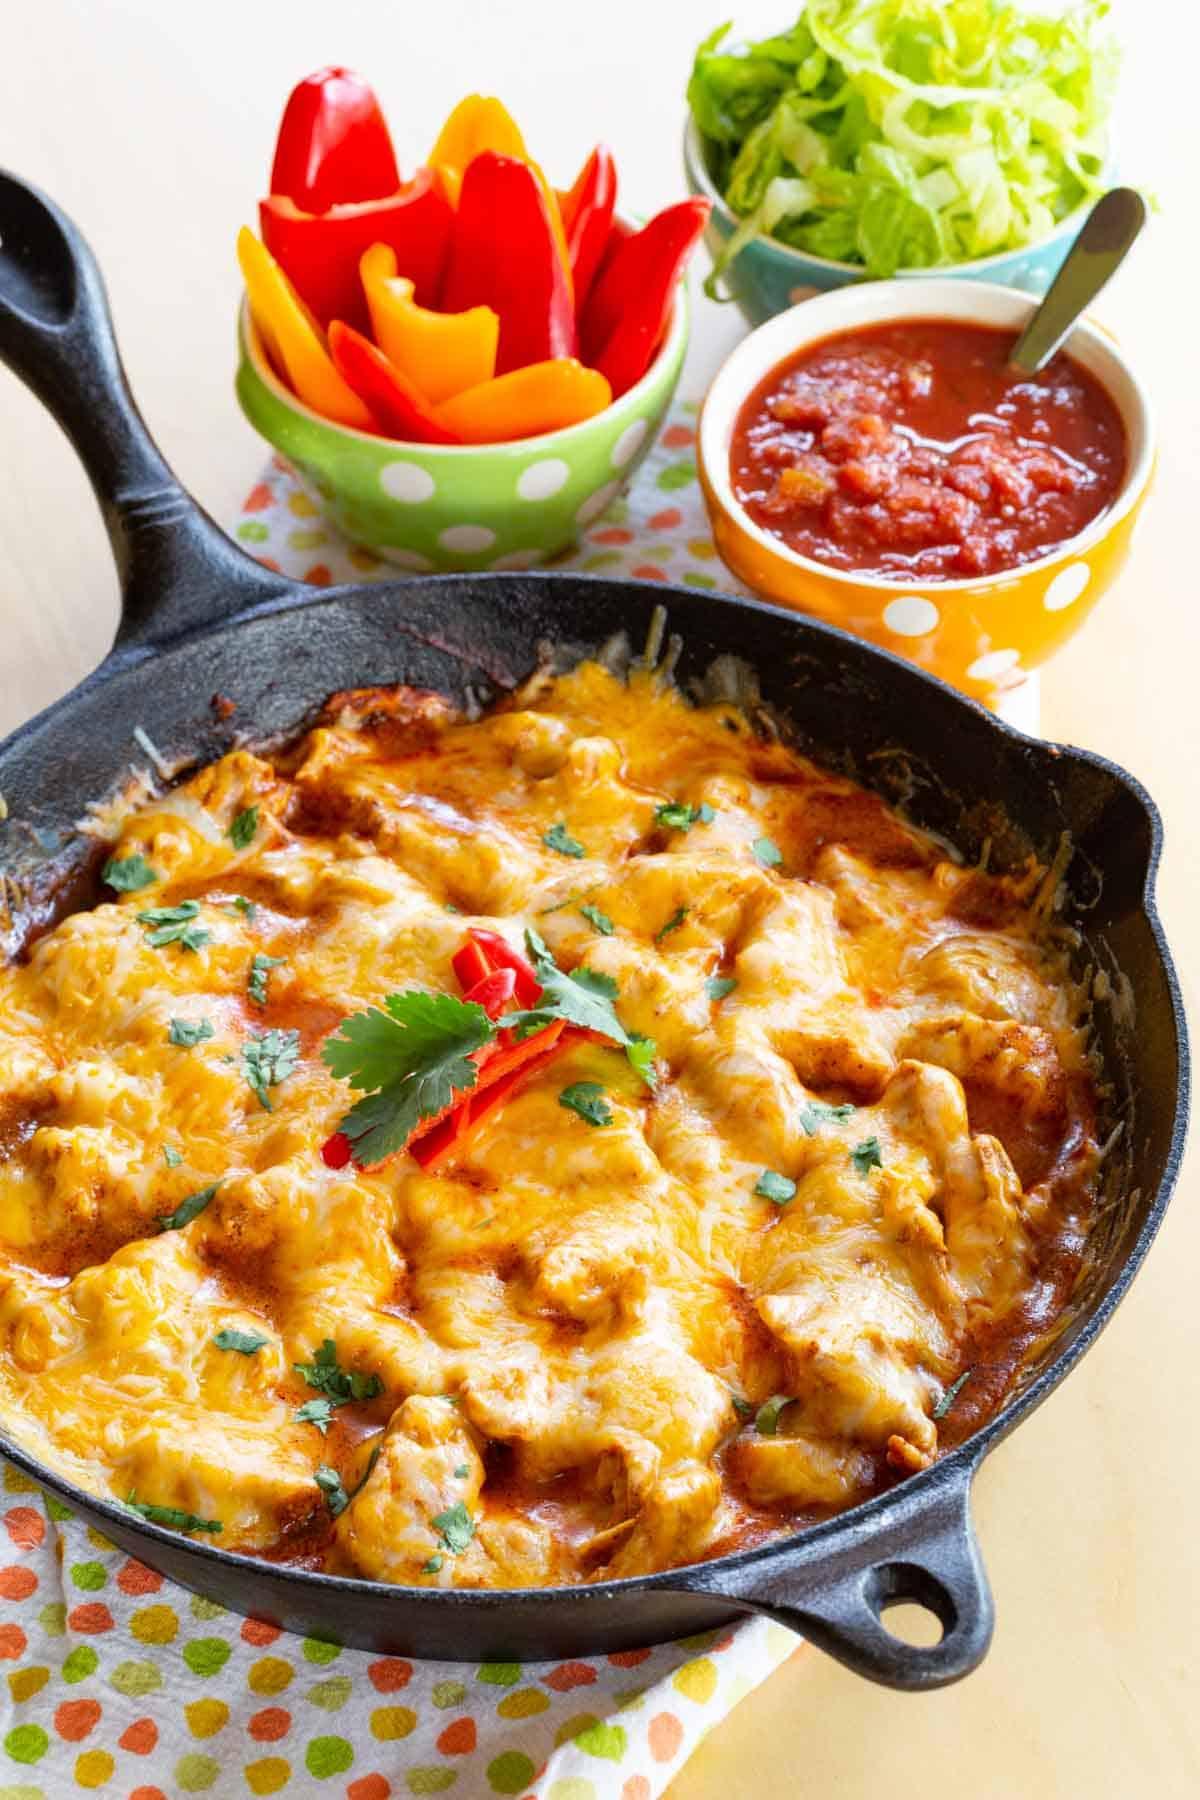 Easy Low Carb Chicken Enchilada Skillet Recipe